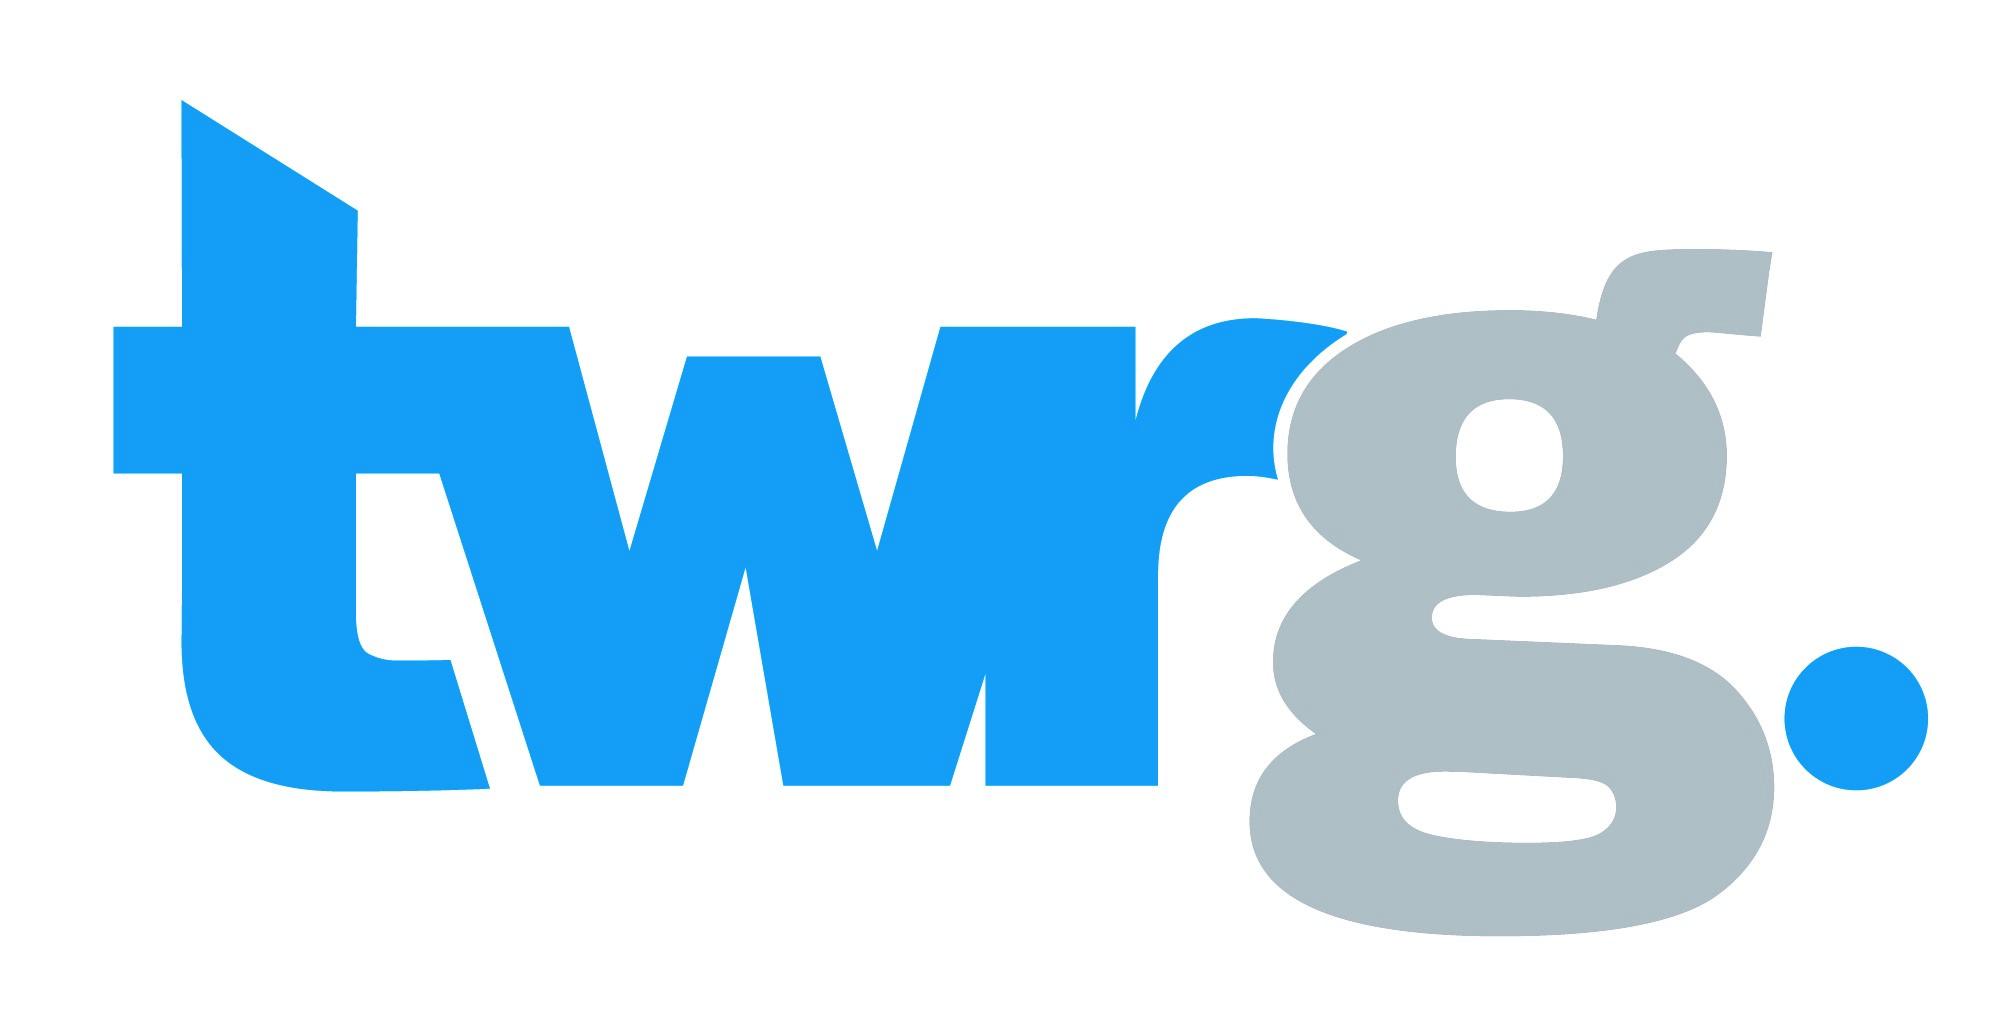 TWRG Ltd